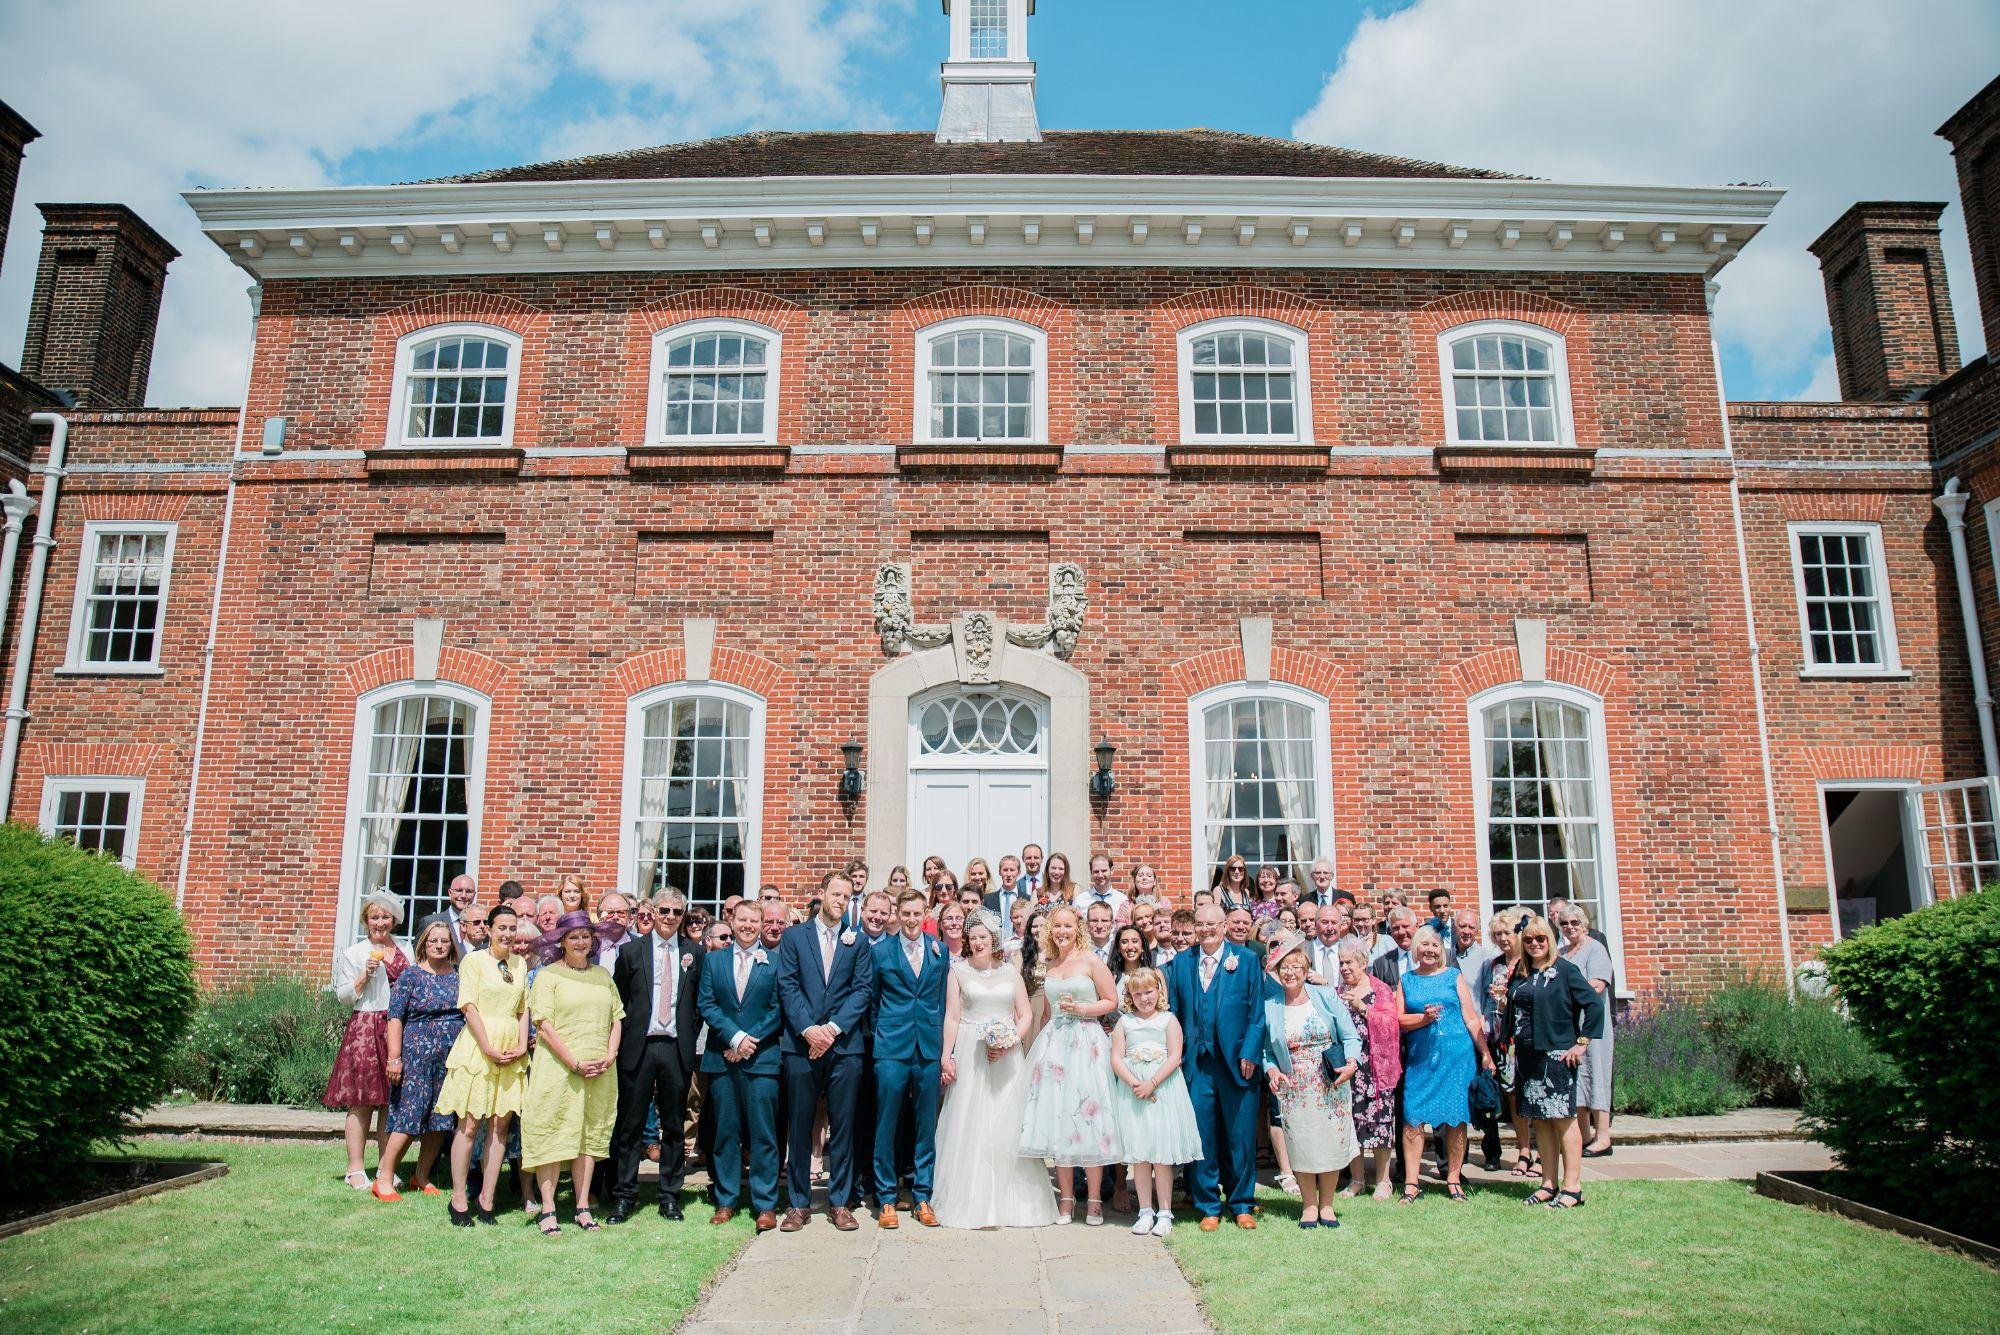 AH Wedding - Laura & Harry 9 (small)